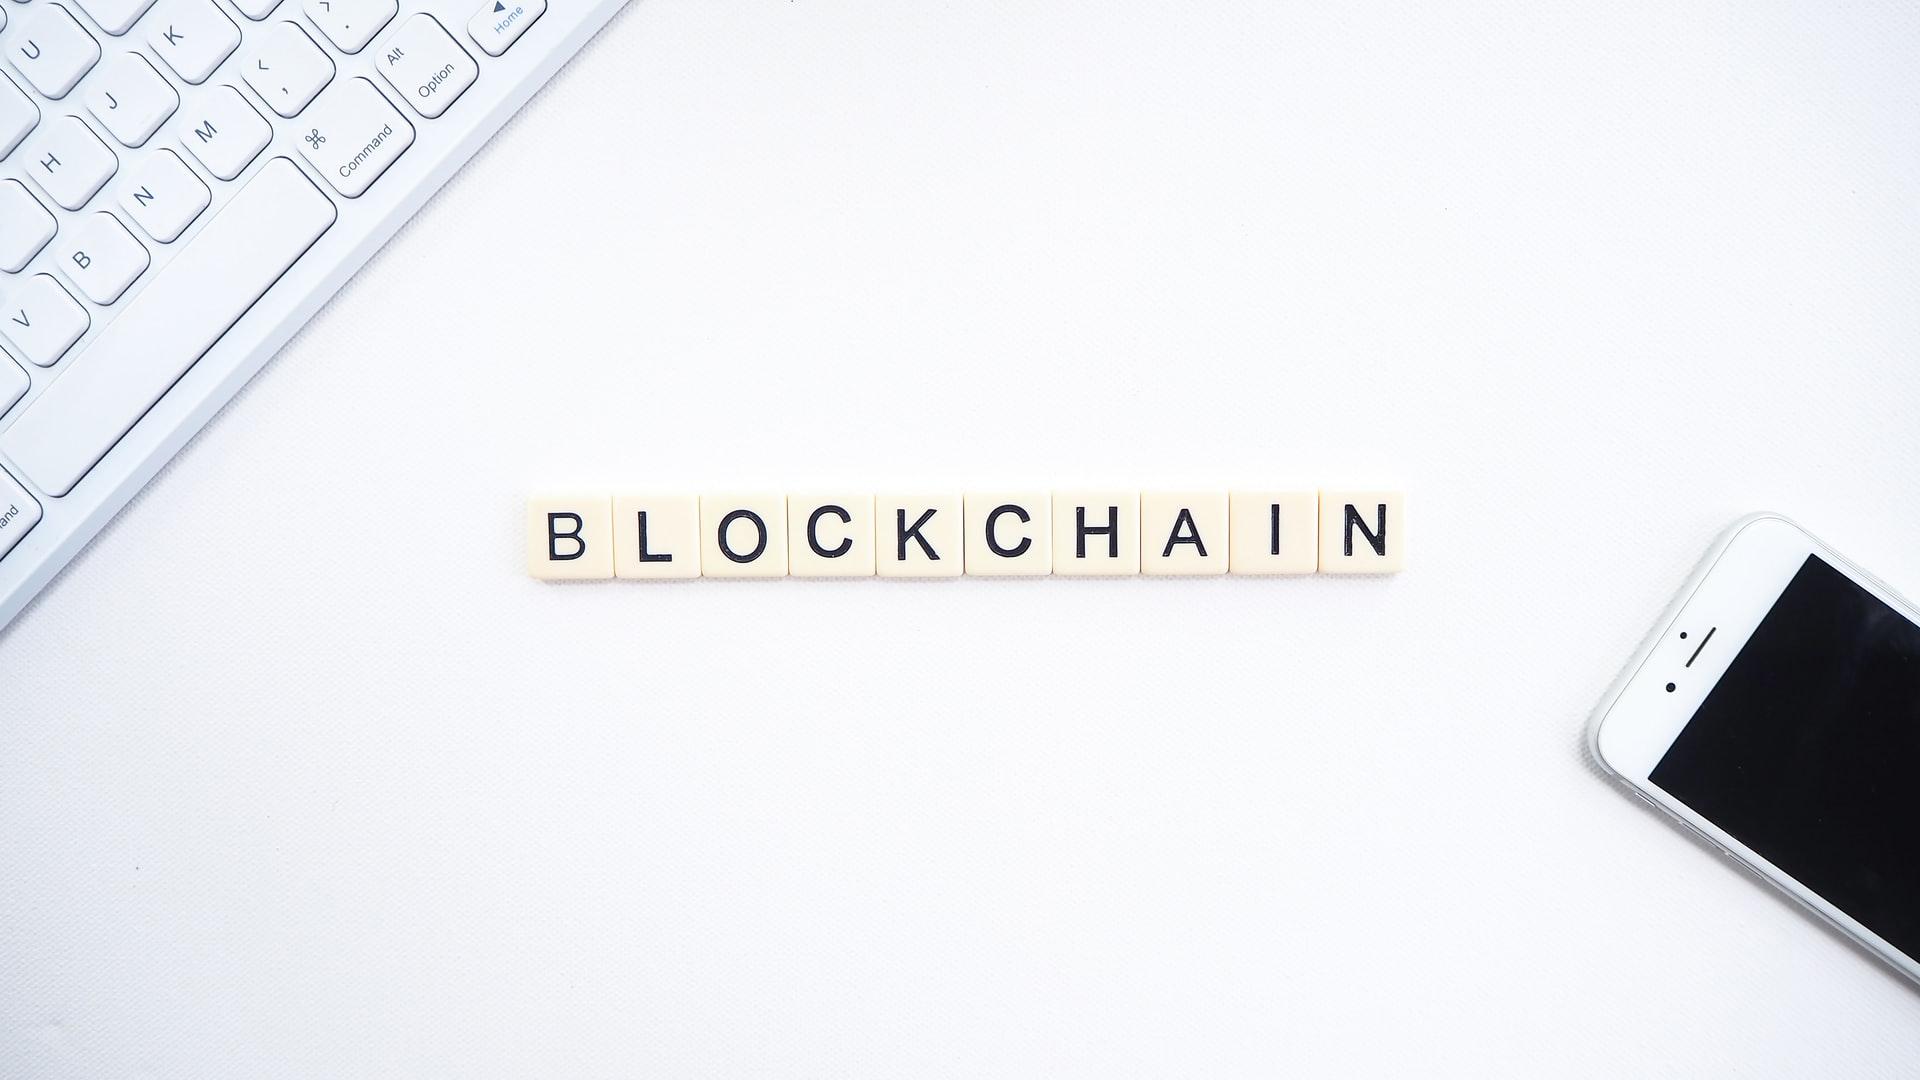 Blockchain preuve